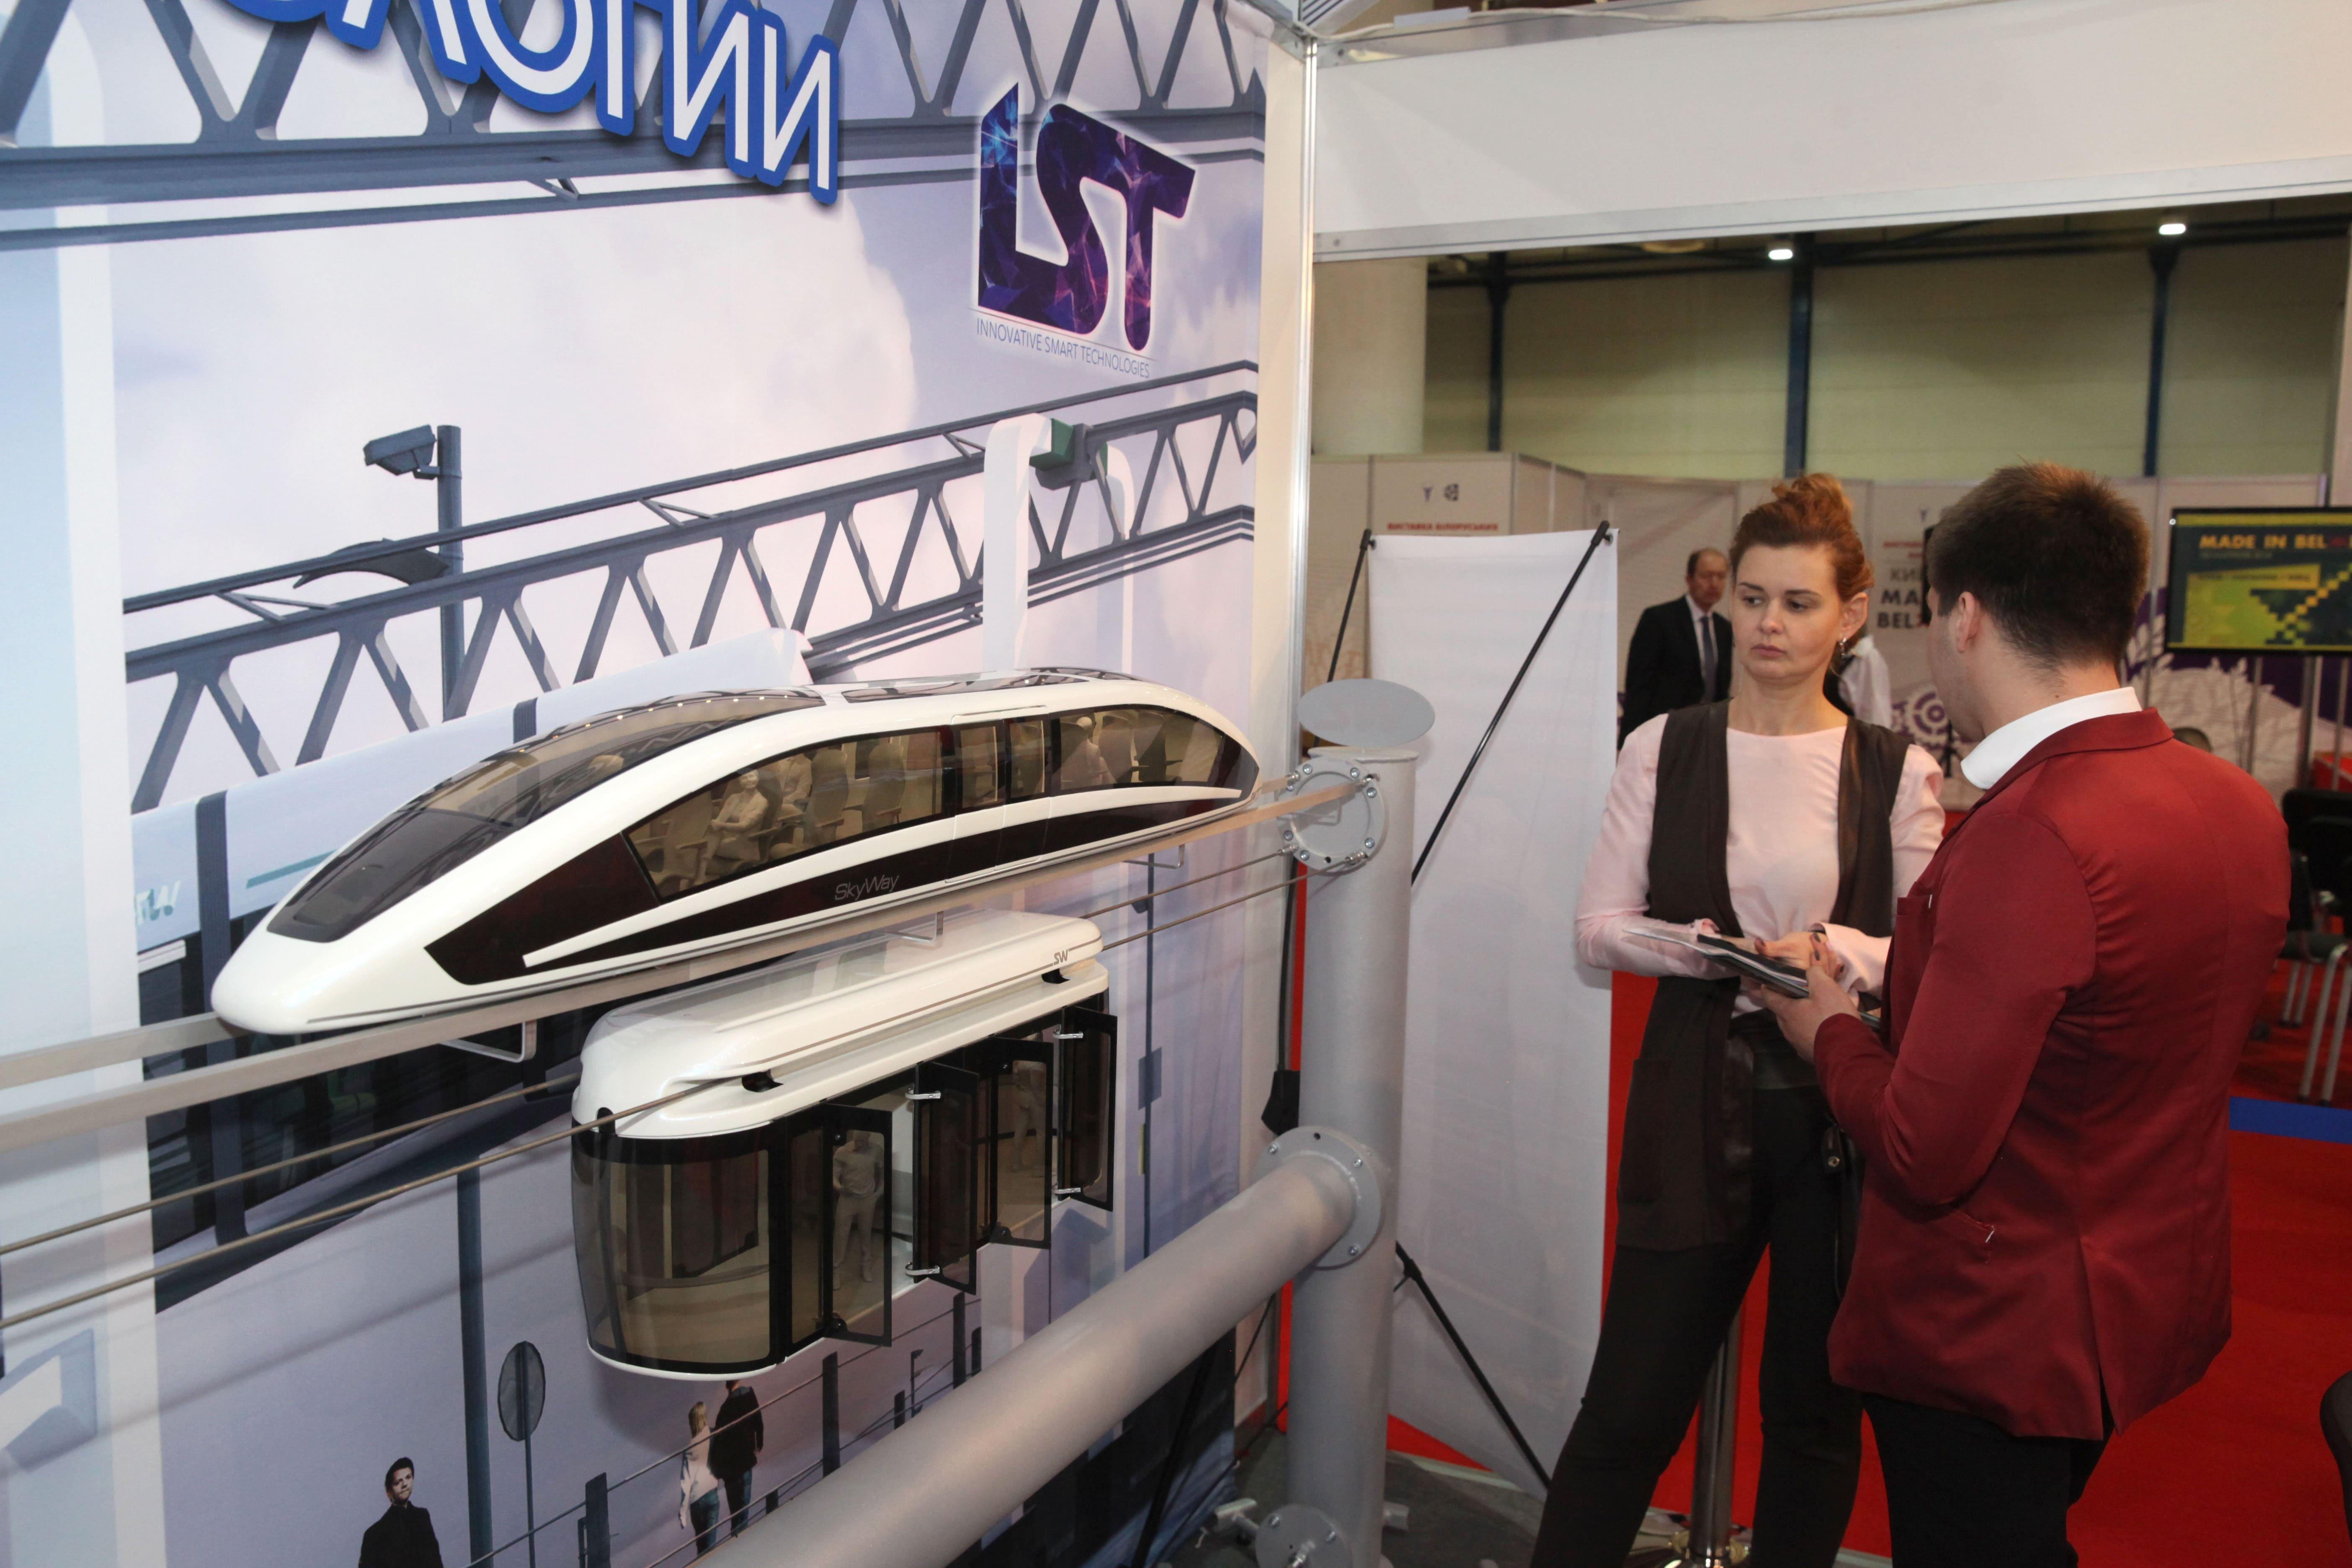 skyway на выставке (1)-min